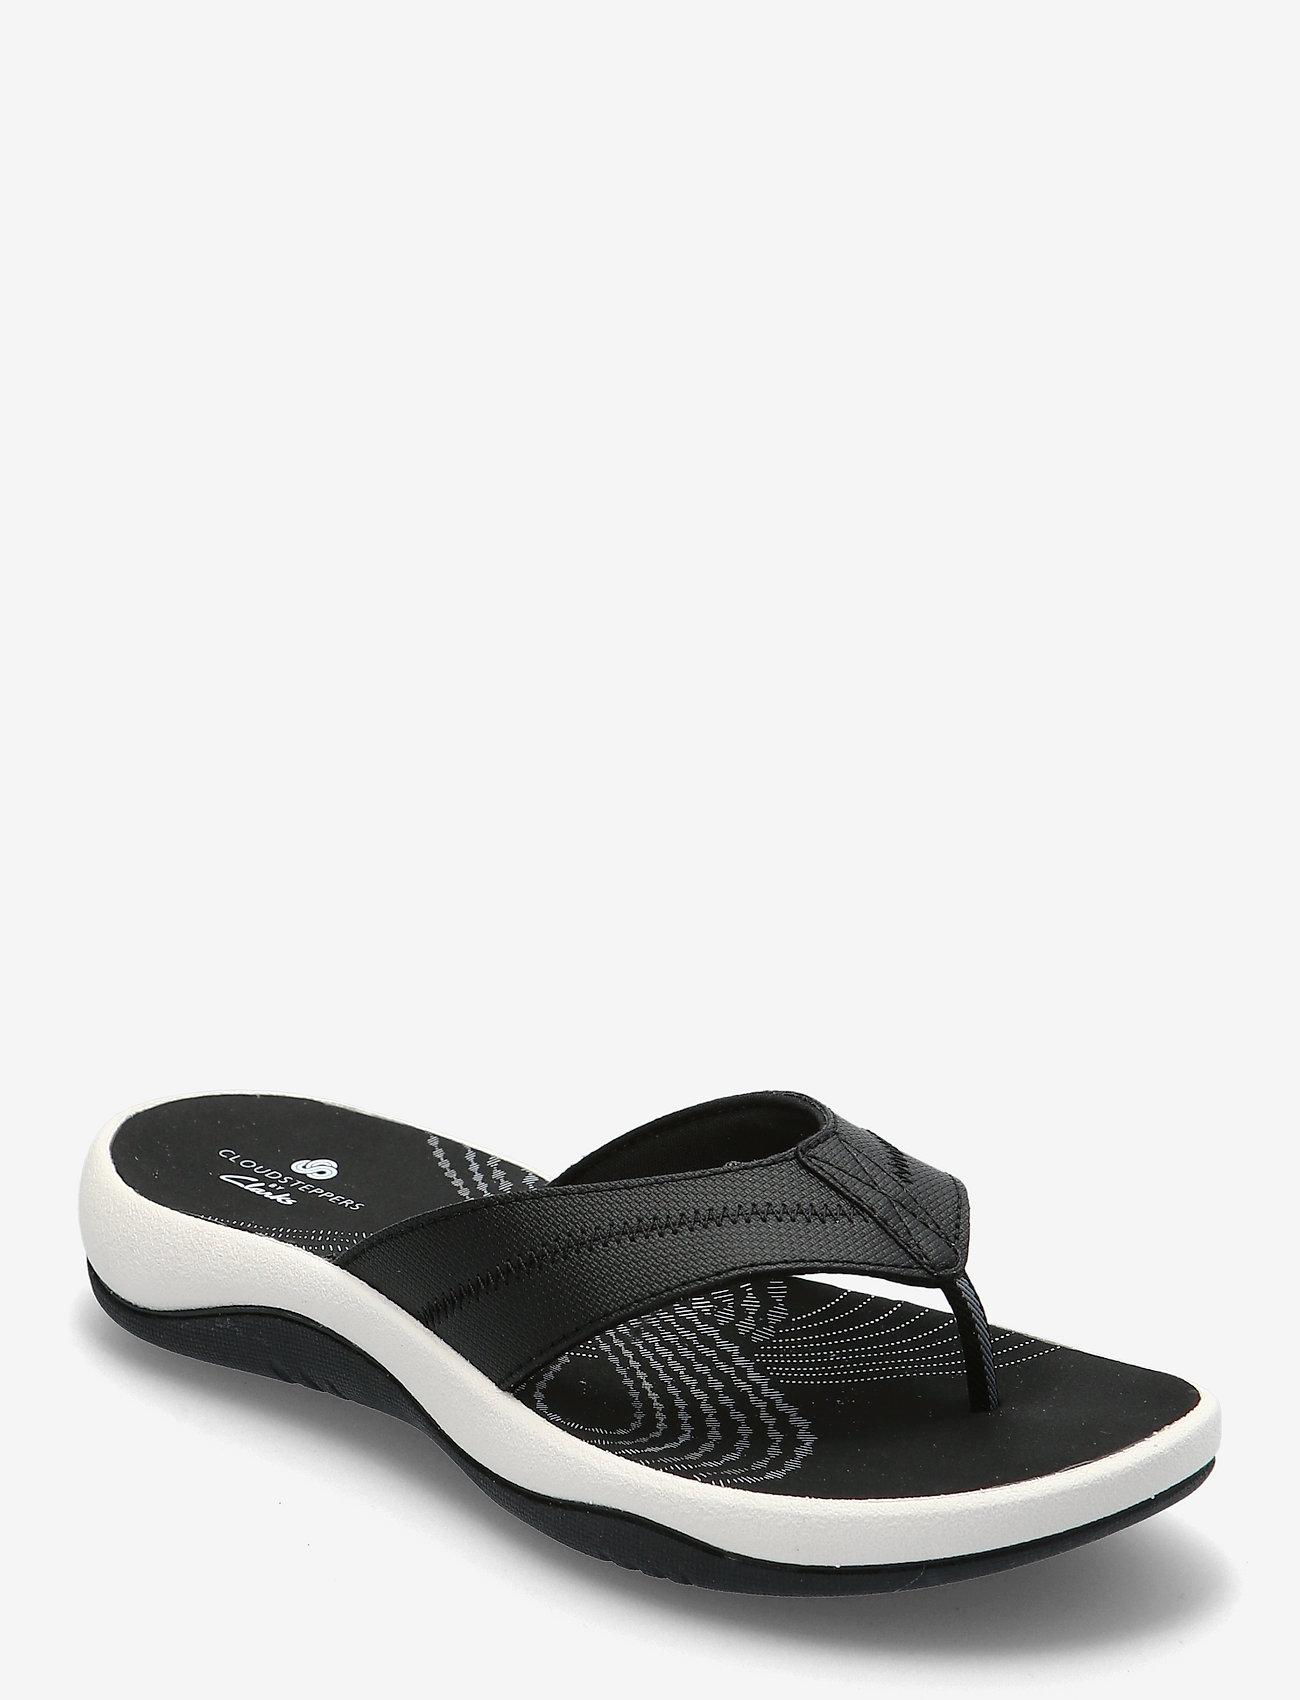 Clarks - Sunni Surf - platta sandaler - black - 0